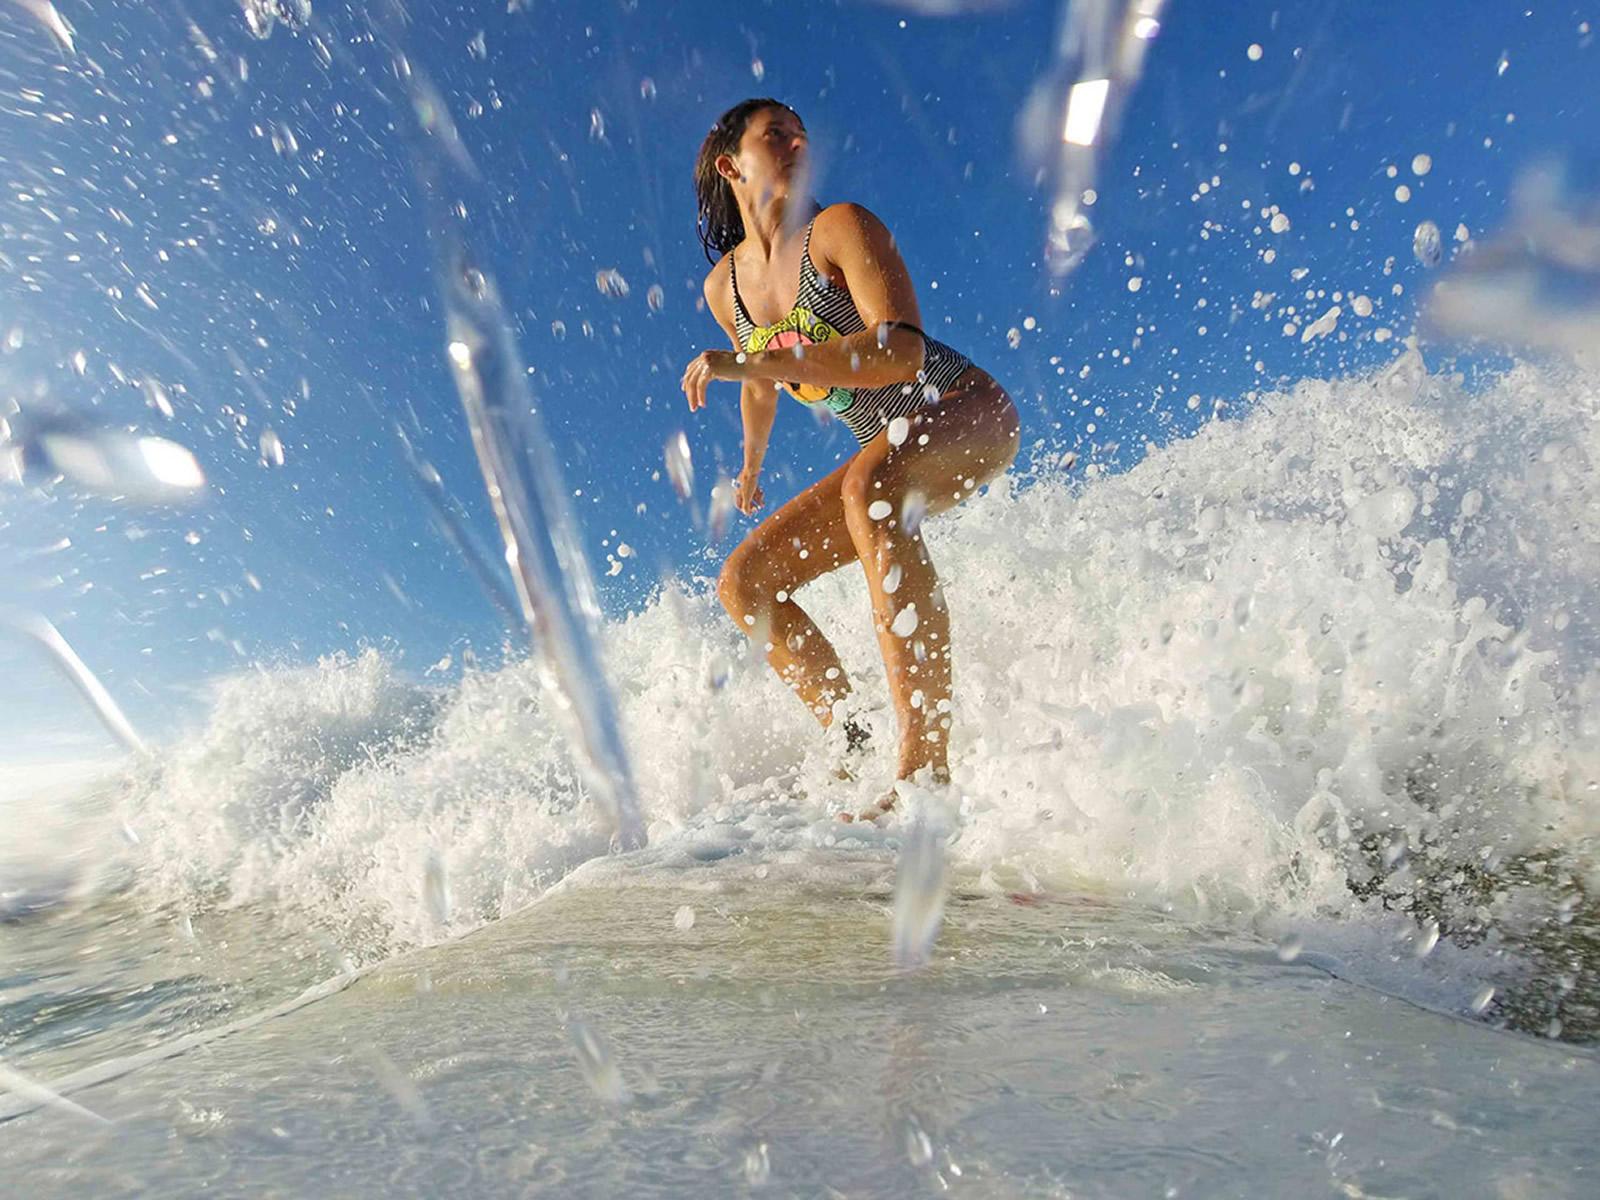 Project_Australia_Surf_Surfer